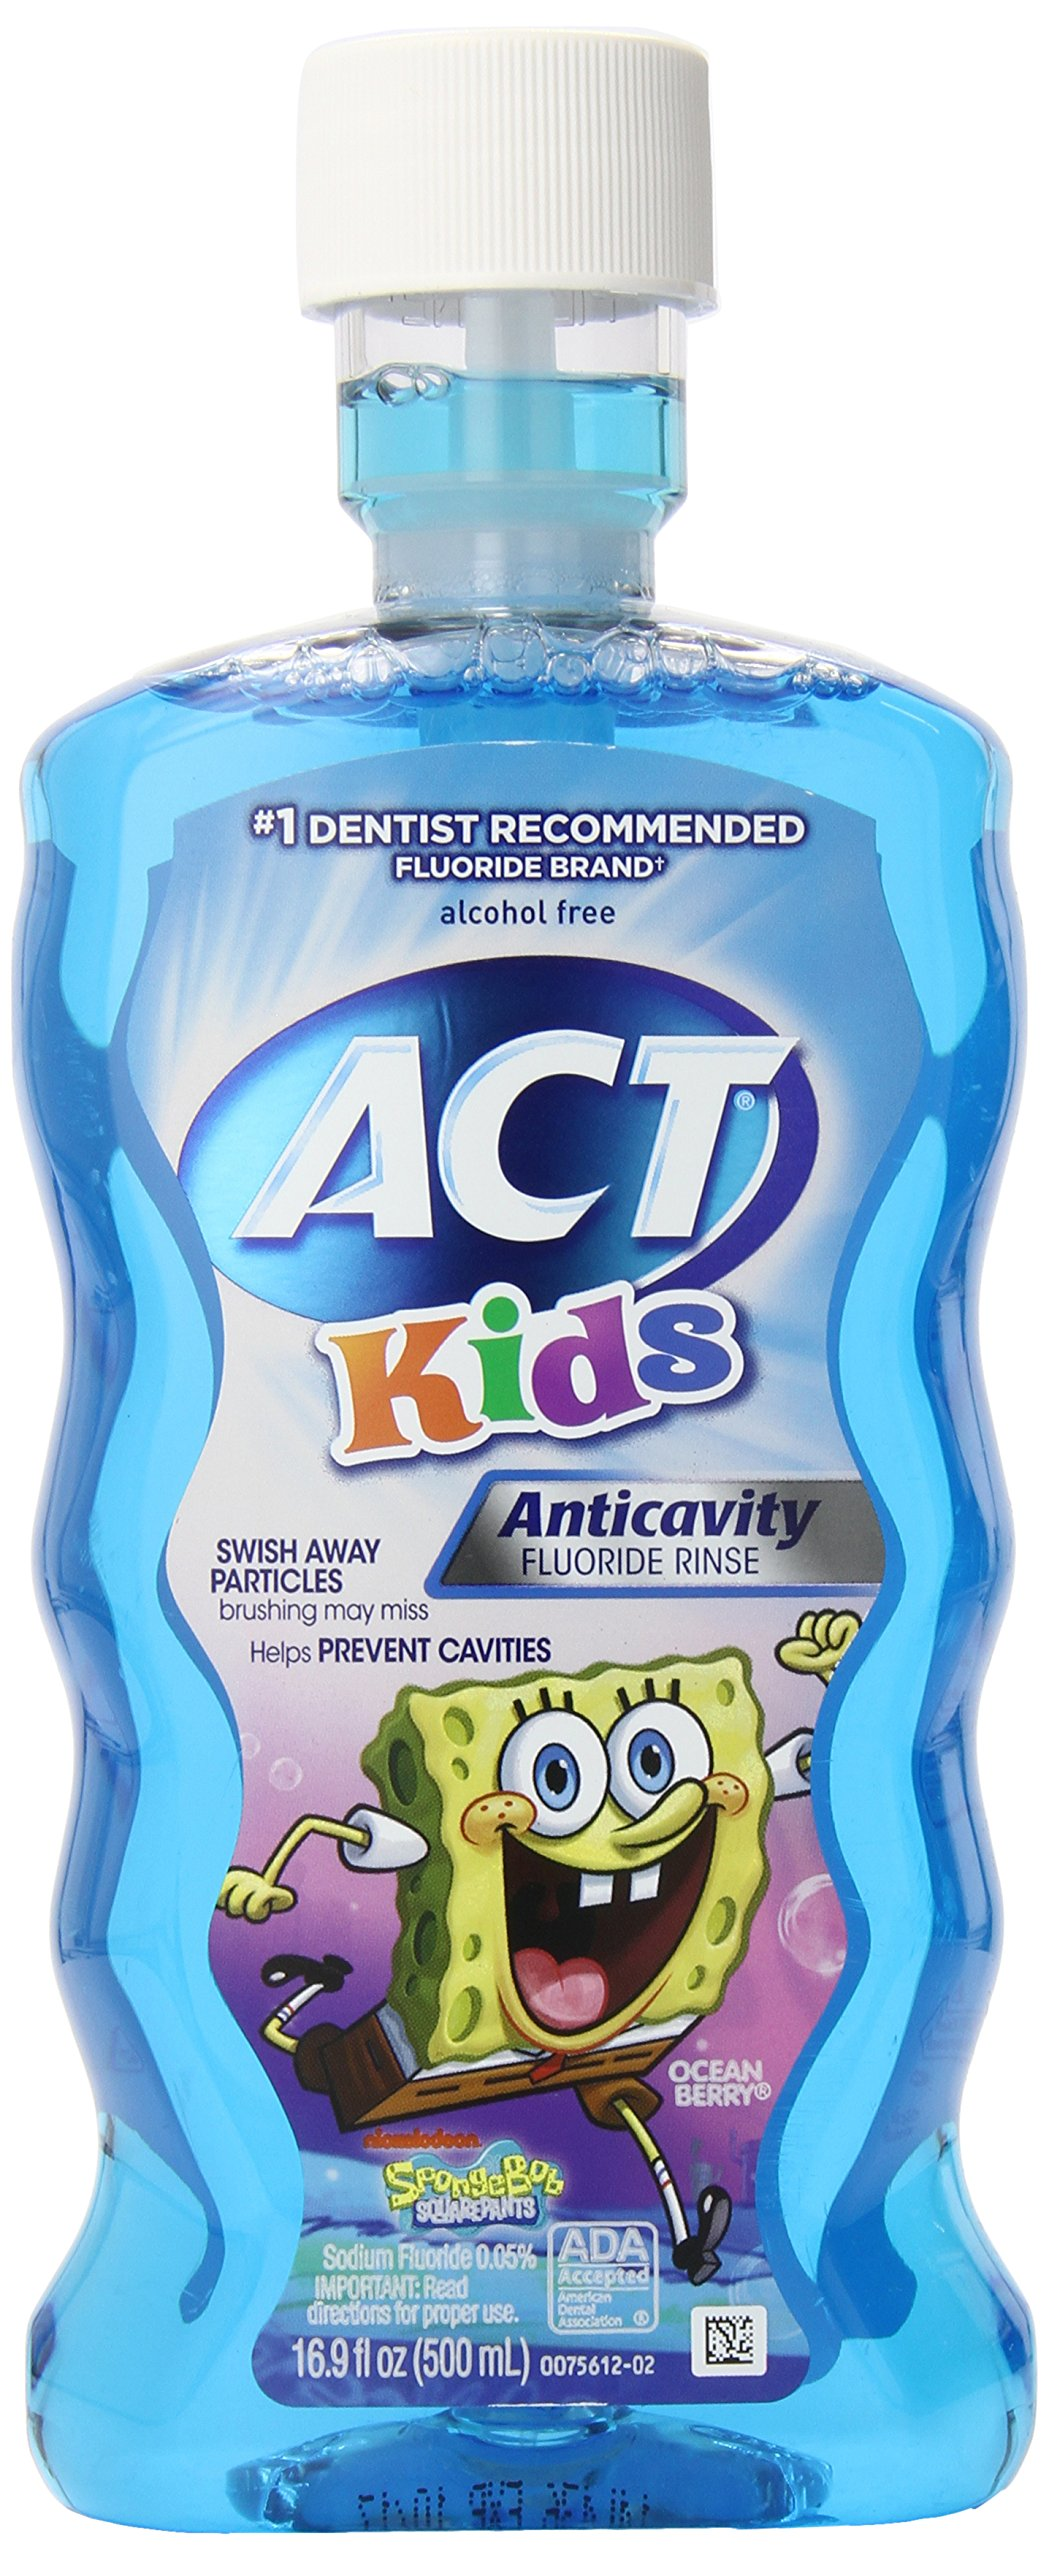 ACT Anti-Cavity Sponge Bob Rinse for Kids, 16.9-Fluid Ounces Bottles (Pack of 6)